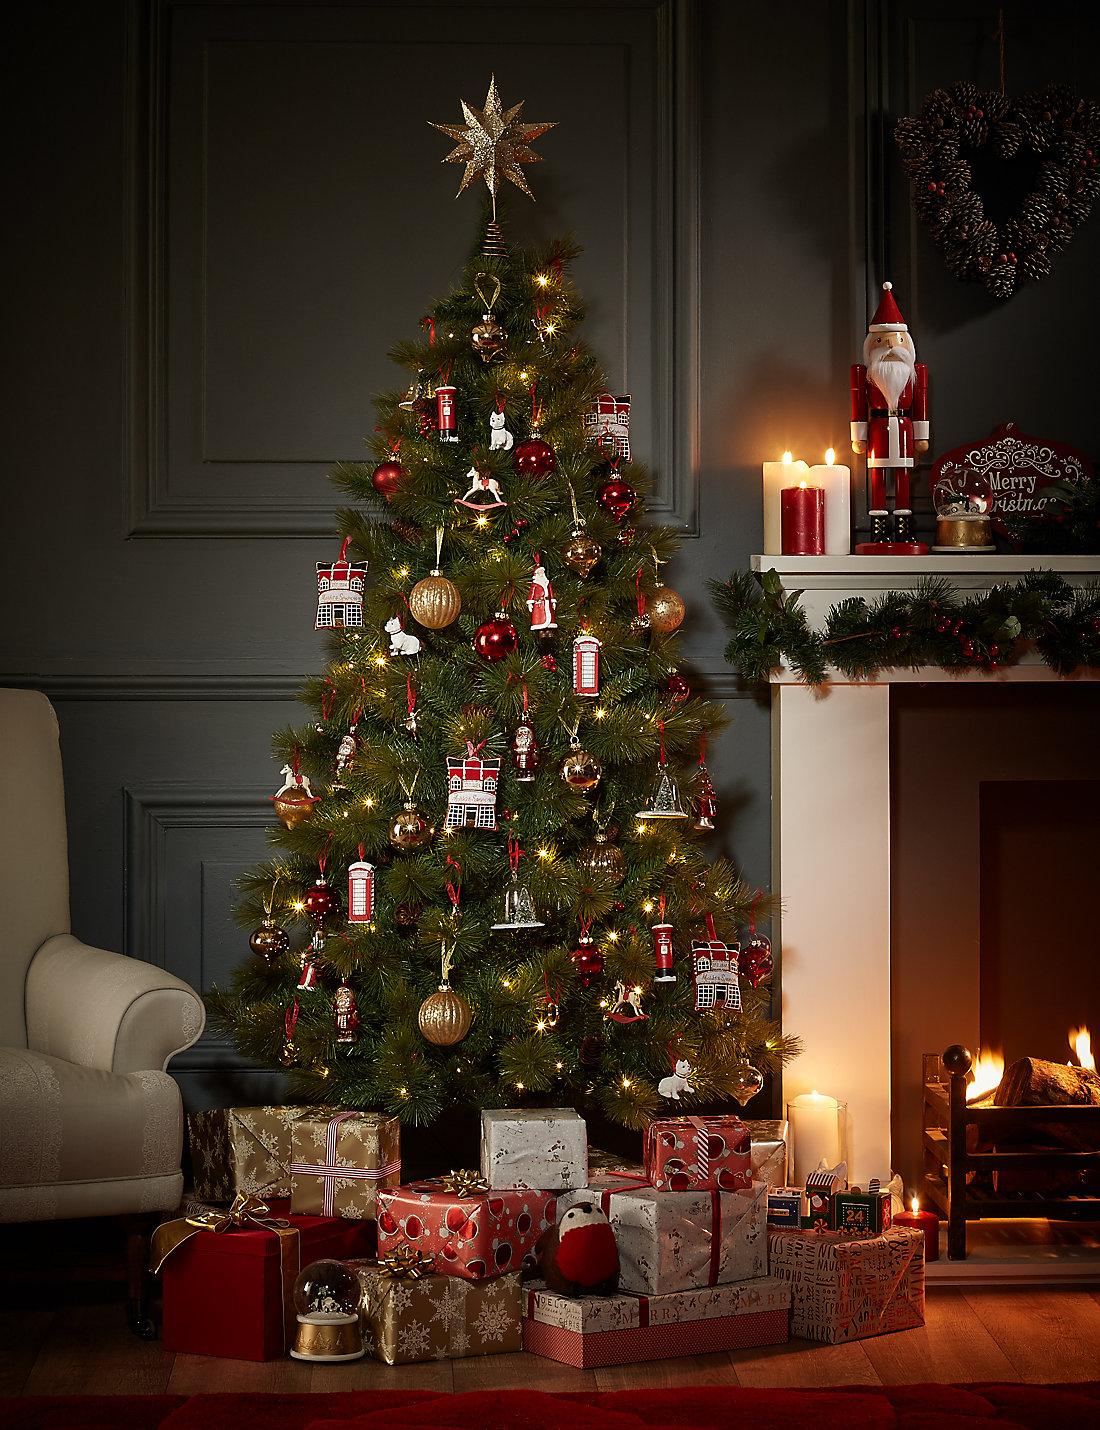 6Ft Pre Lit Mount Beacon Berry Pine Cone Christmas Tree M S - 6 Ft Christmas Tree